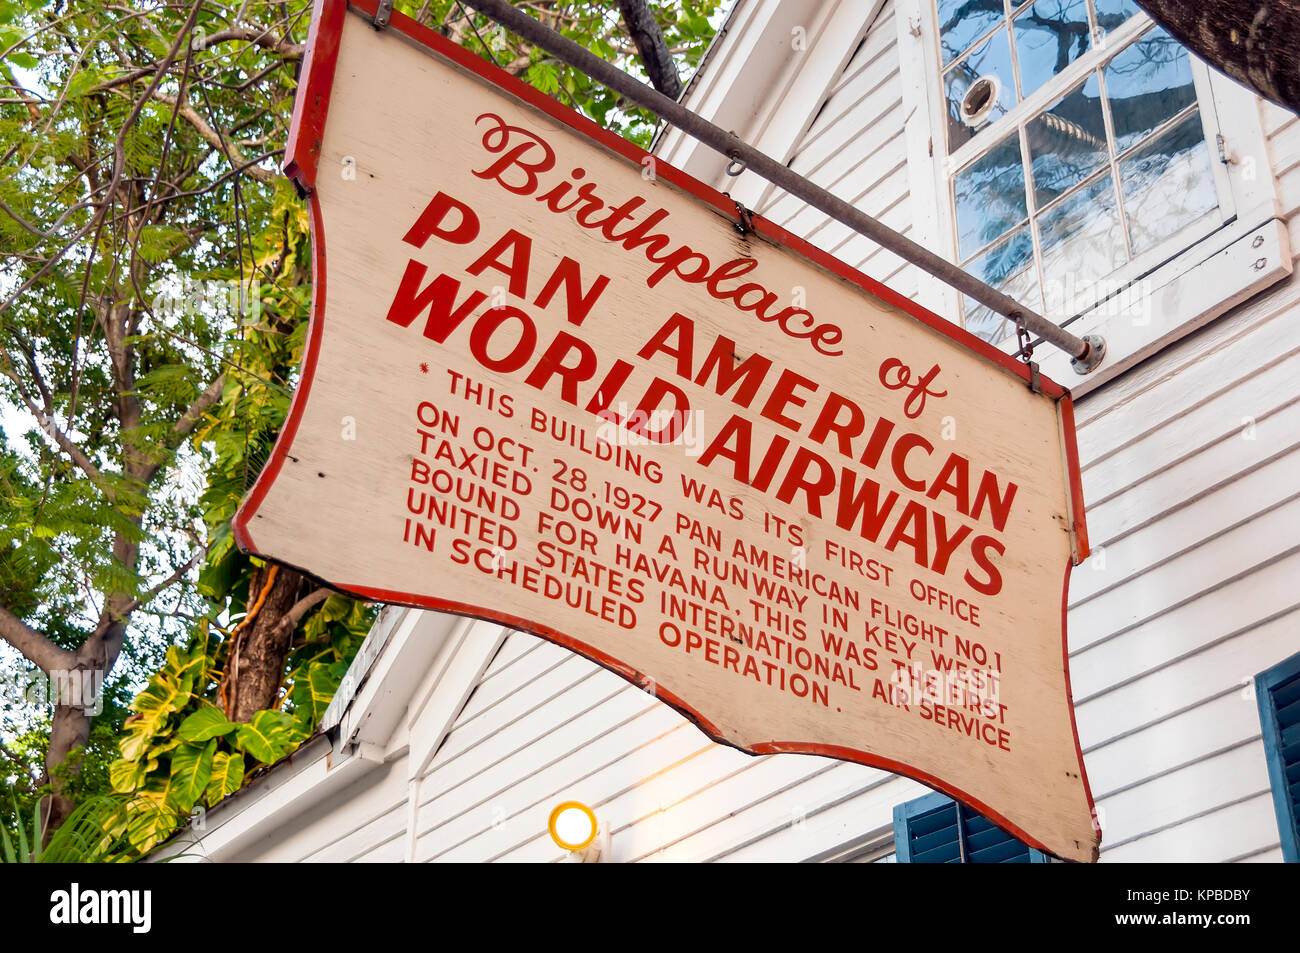 Birthplace of Pan Amerian World Airways Sign, Key West, Florida - Stock Image